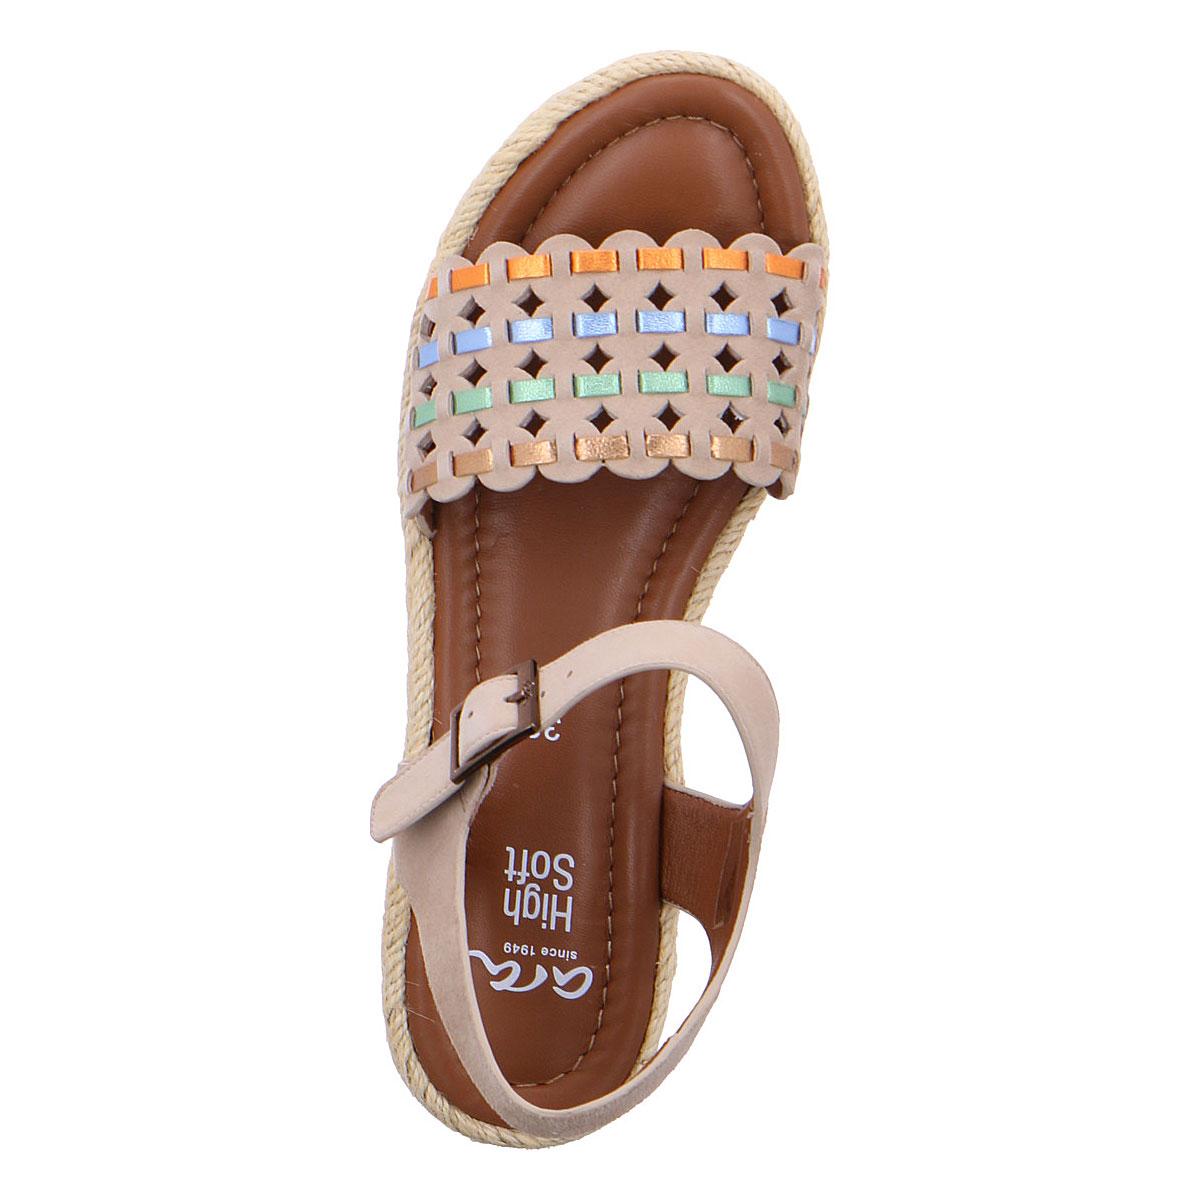 Дамски сандали на платформа Ара / ara 12-28404-06 кафяви - снимка 6